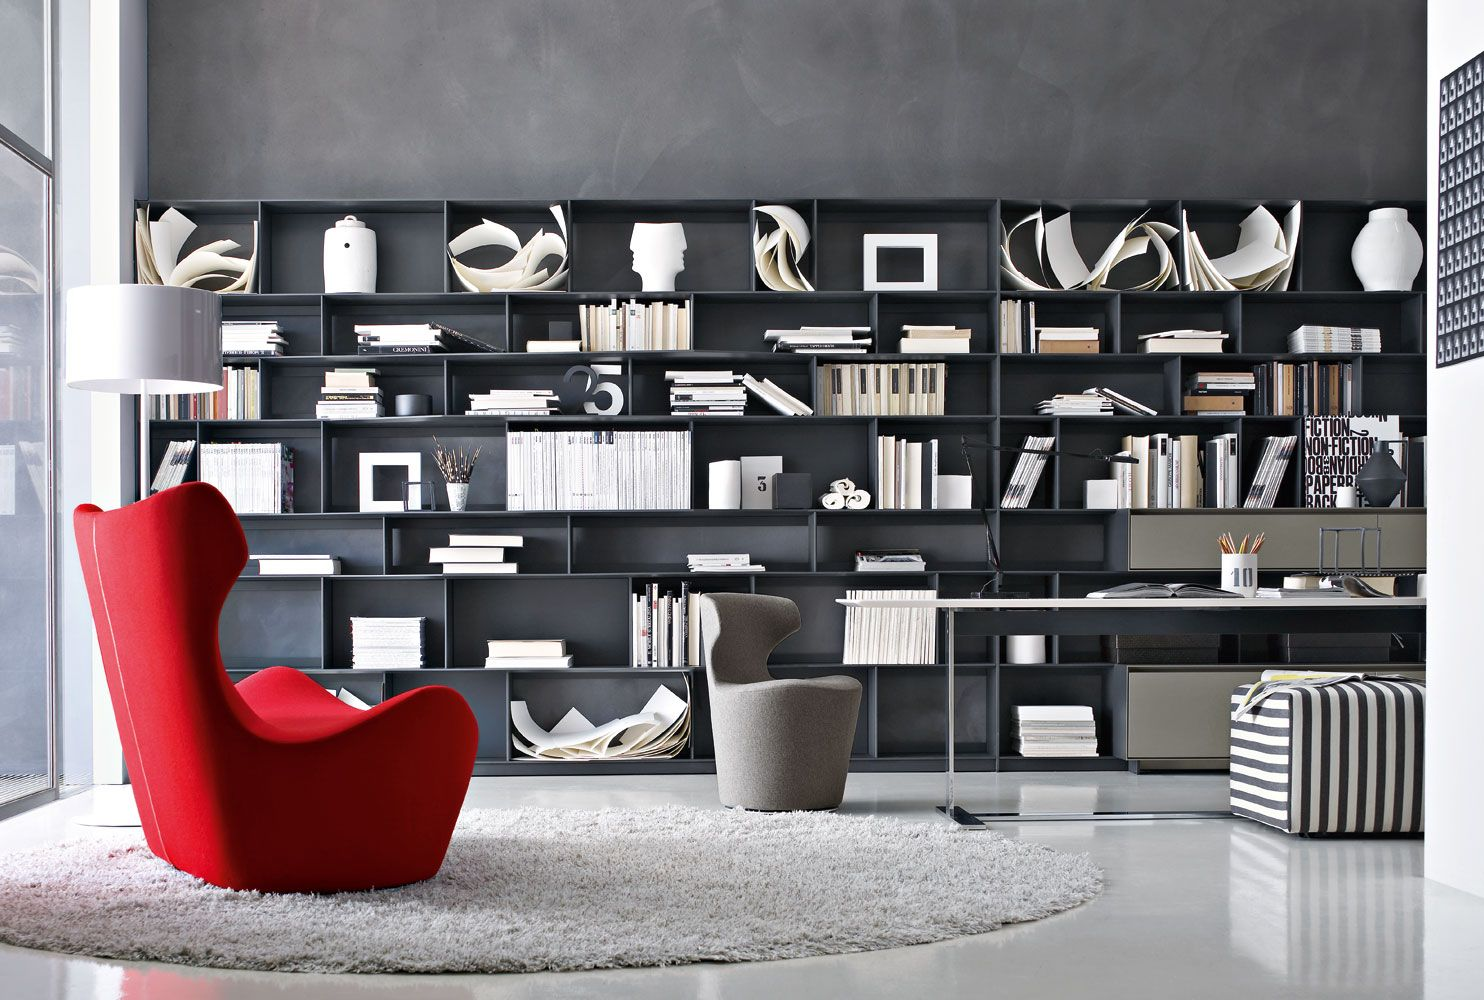 System Bookcase FLATC Collection BampB Italia Design